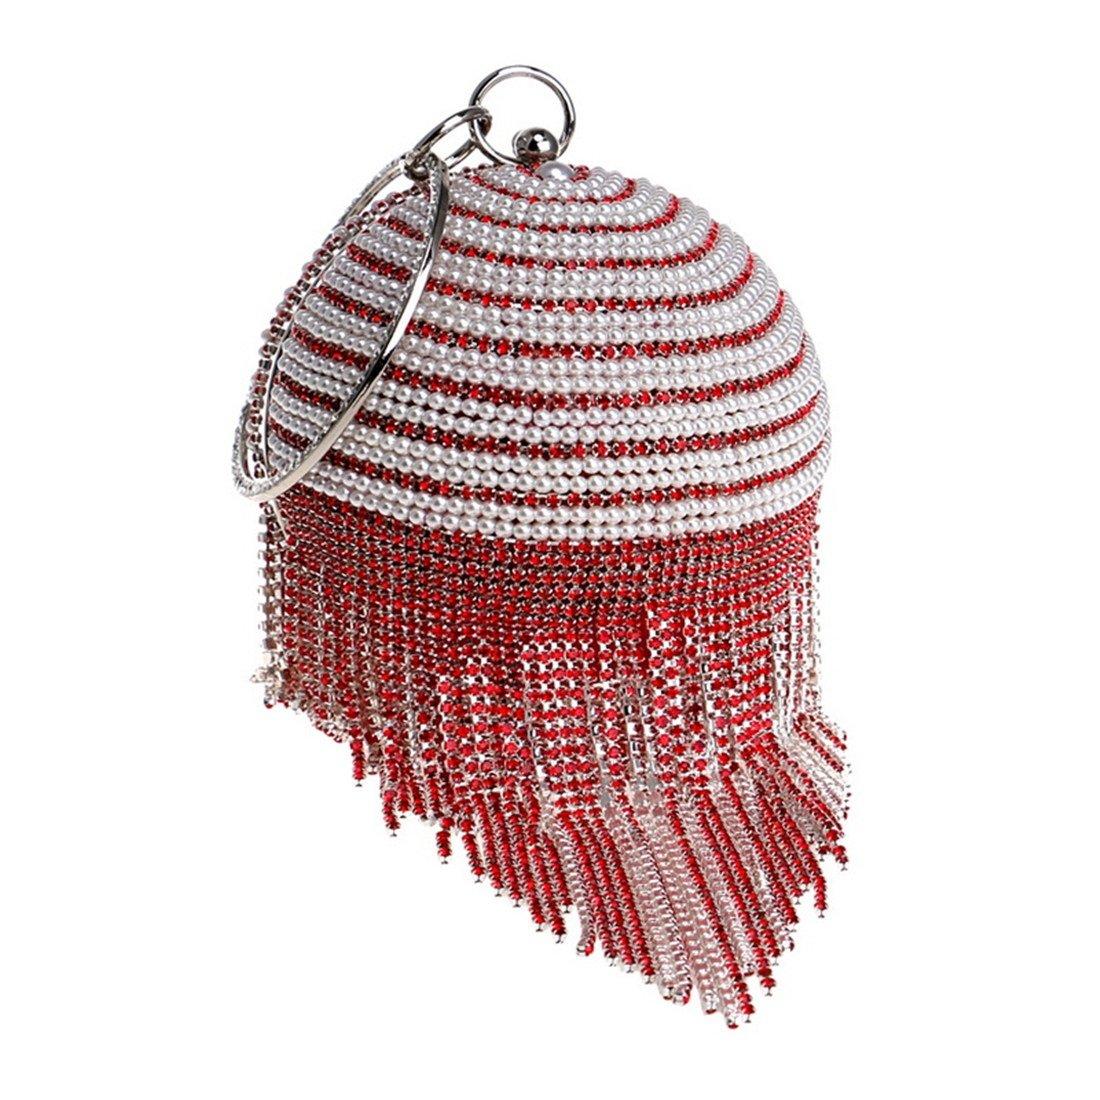 777fa3e9eb911 Haxibkena Frauen Clutch Abendtasche Abendtasche Abendtasche Partykleid  Hochzeit Tasche Quaste Handtasche (Farbe rot) B07L955WW3 Clutches Won hoch  geschätzt ...